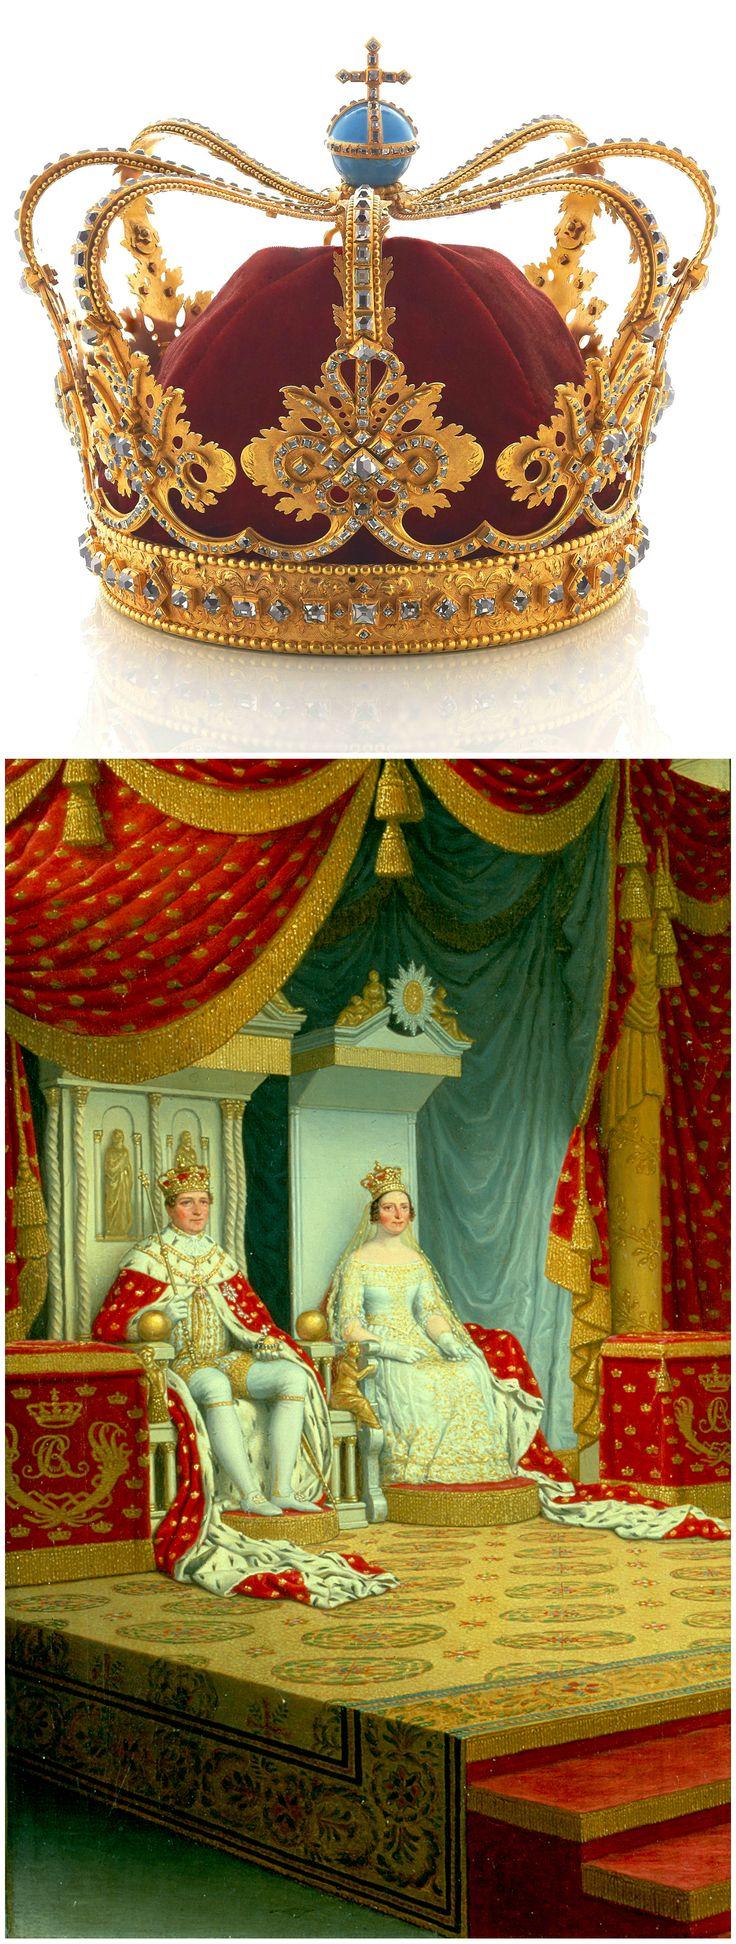 Above: Crown, worn by Danish queens from 1731 to 1840. Rosenborg Castle (link: http://www.kongernessamling.dk/rosenborg/object/dronningens-krone/). Below: Painting depicting Christian VIII and Caroline Amalie's coronation and anointing, June 28, 1840, by Christoffer Wilhelm Eckersberg, 1840. National History Museum, Frederiksborg Castle, via Wikimedia Commons (link: https://commons.wikimedia.org/wiki/File:Christian_VIIIs_salving_by_Eckersberg.jpg).